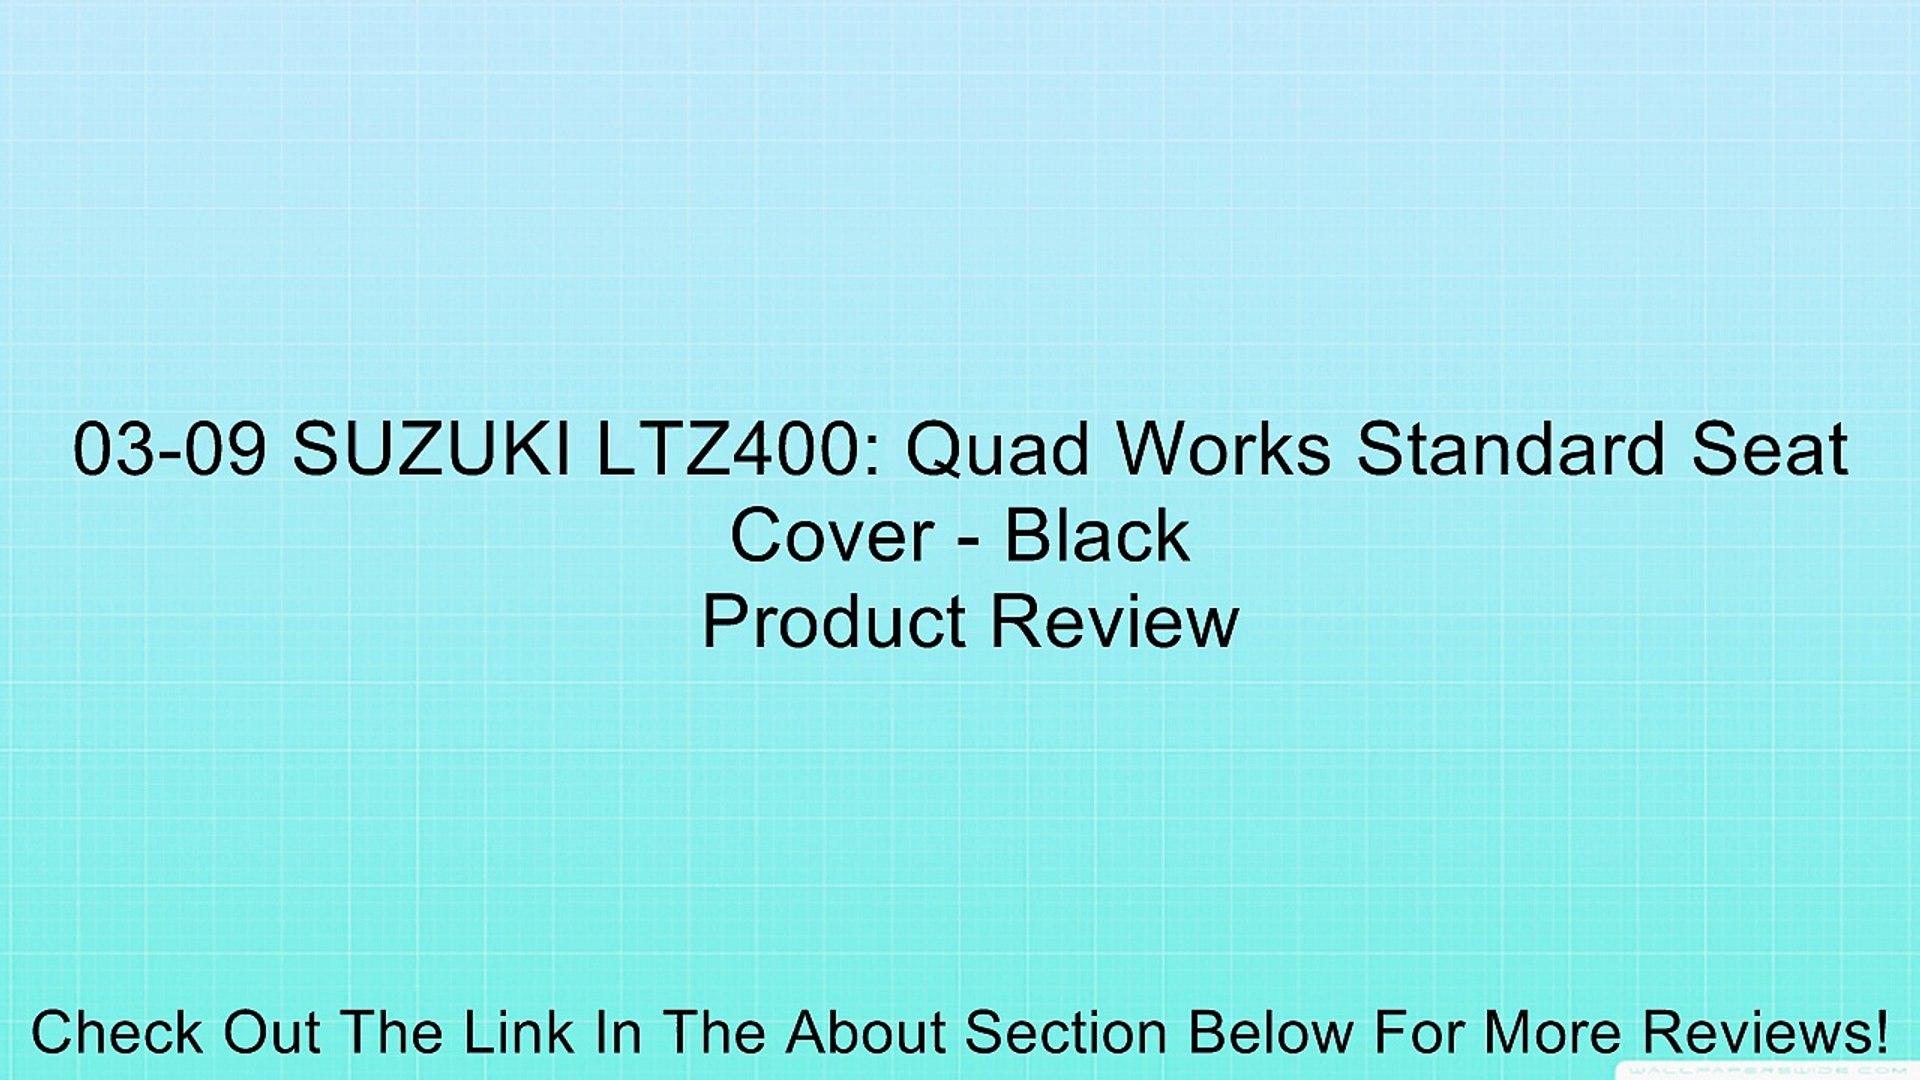 DOUBLE DELUXE GREY//BLACK VAN SEAT COVERS SINGLE RENAULT TRAFIC SPORT